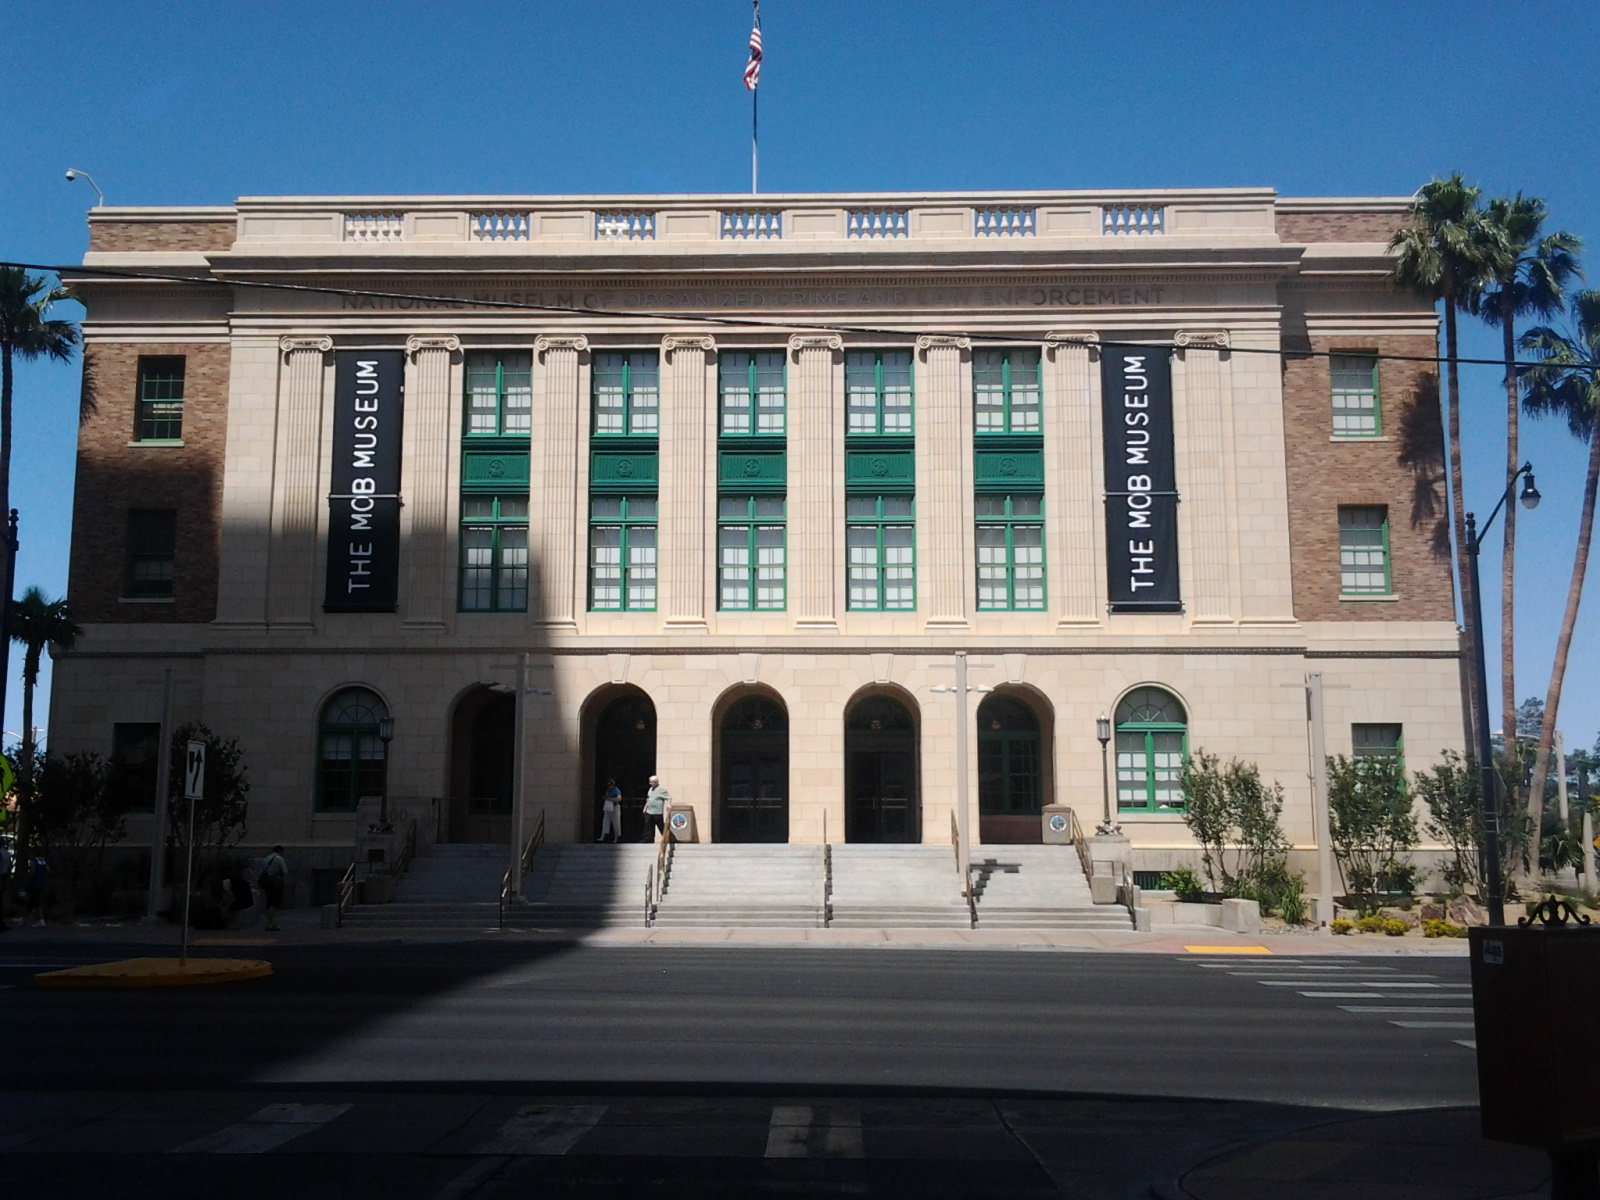 las vegas mob museum downtown